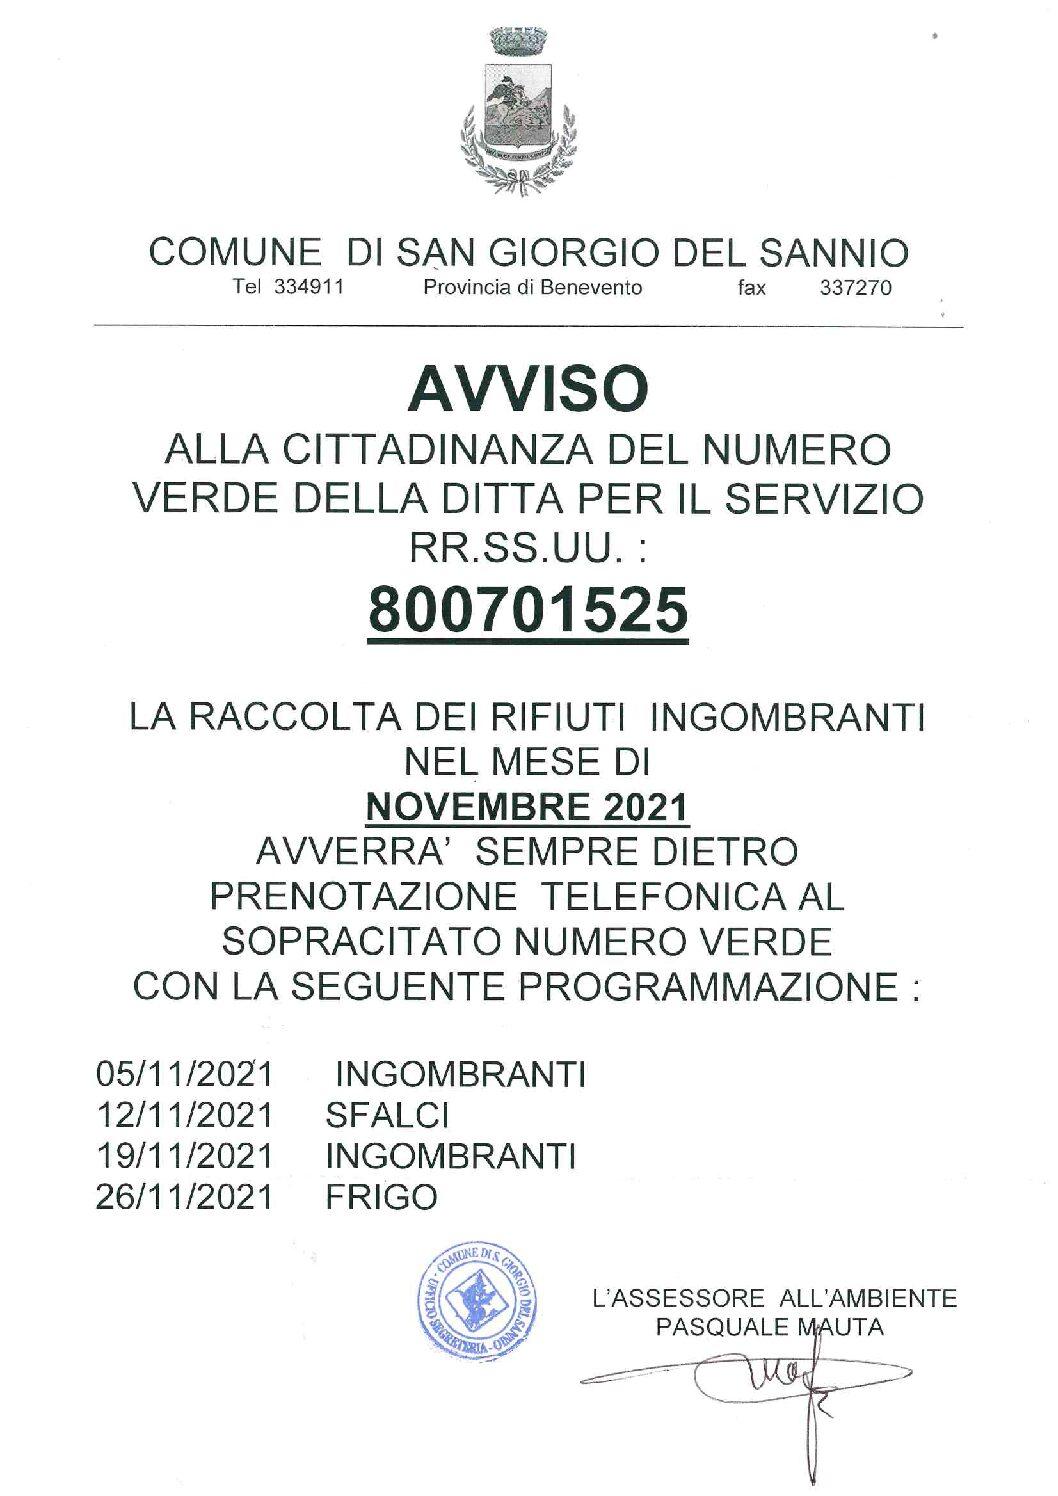 Calendario raccolta rifiuti ingombranti. Novembre 2021